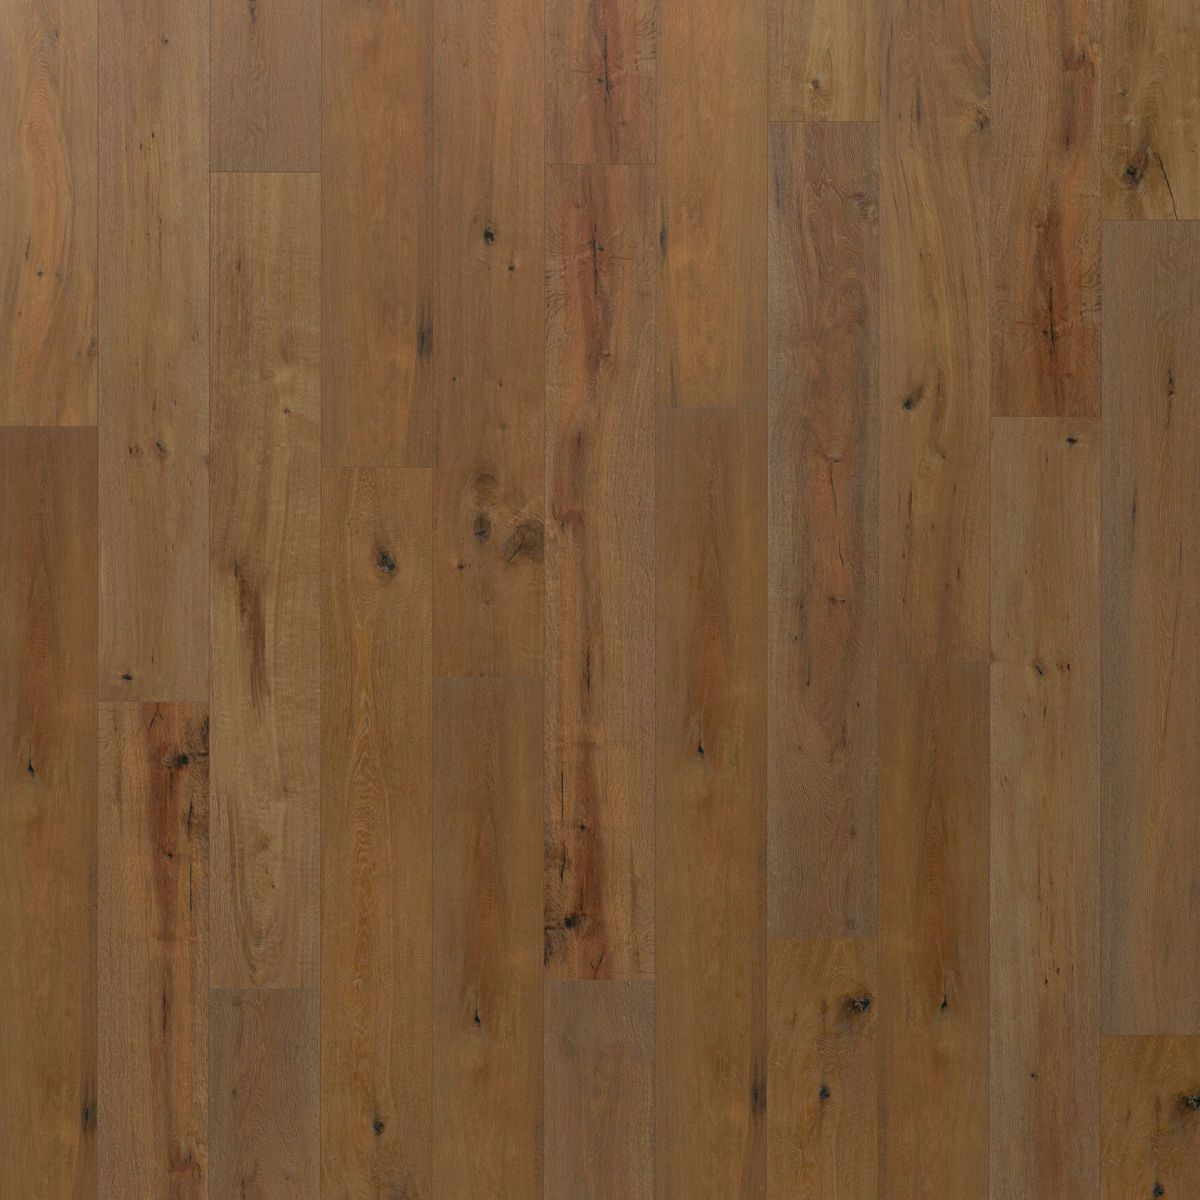 Avatara vloerdelen hout N08 plan